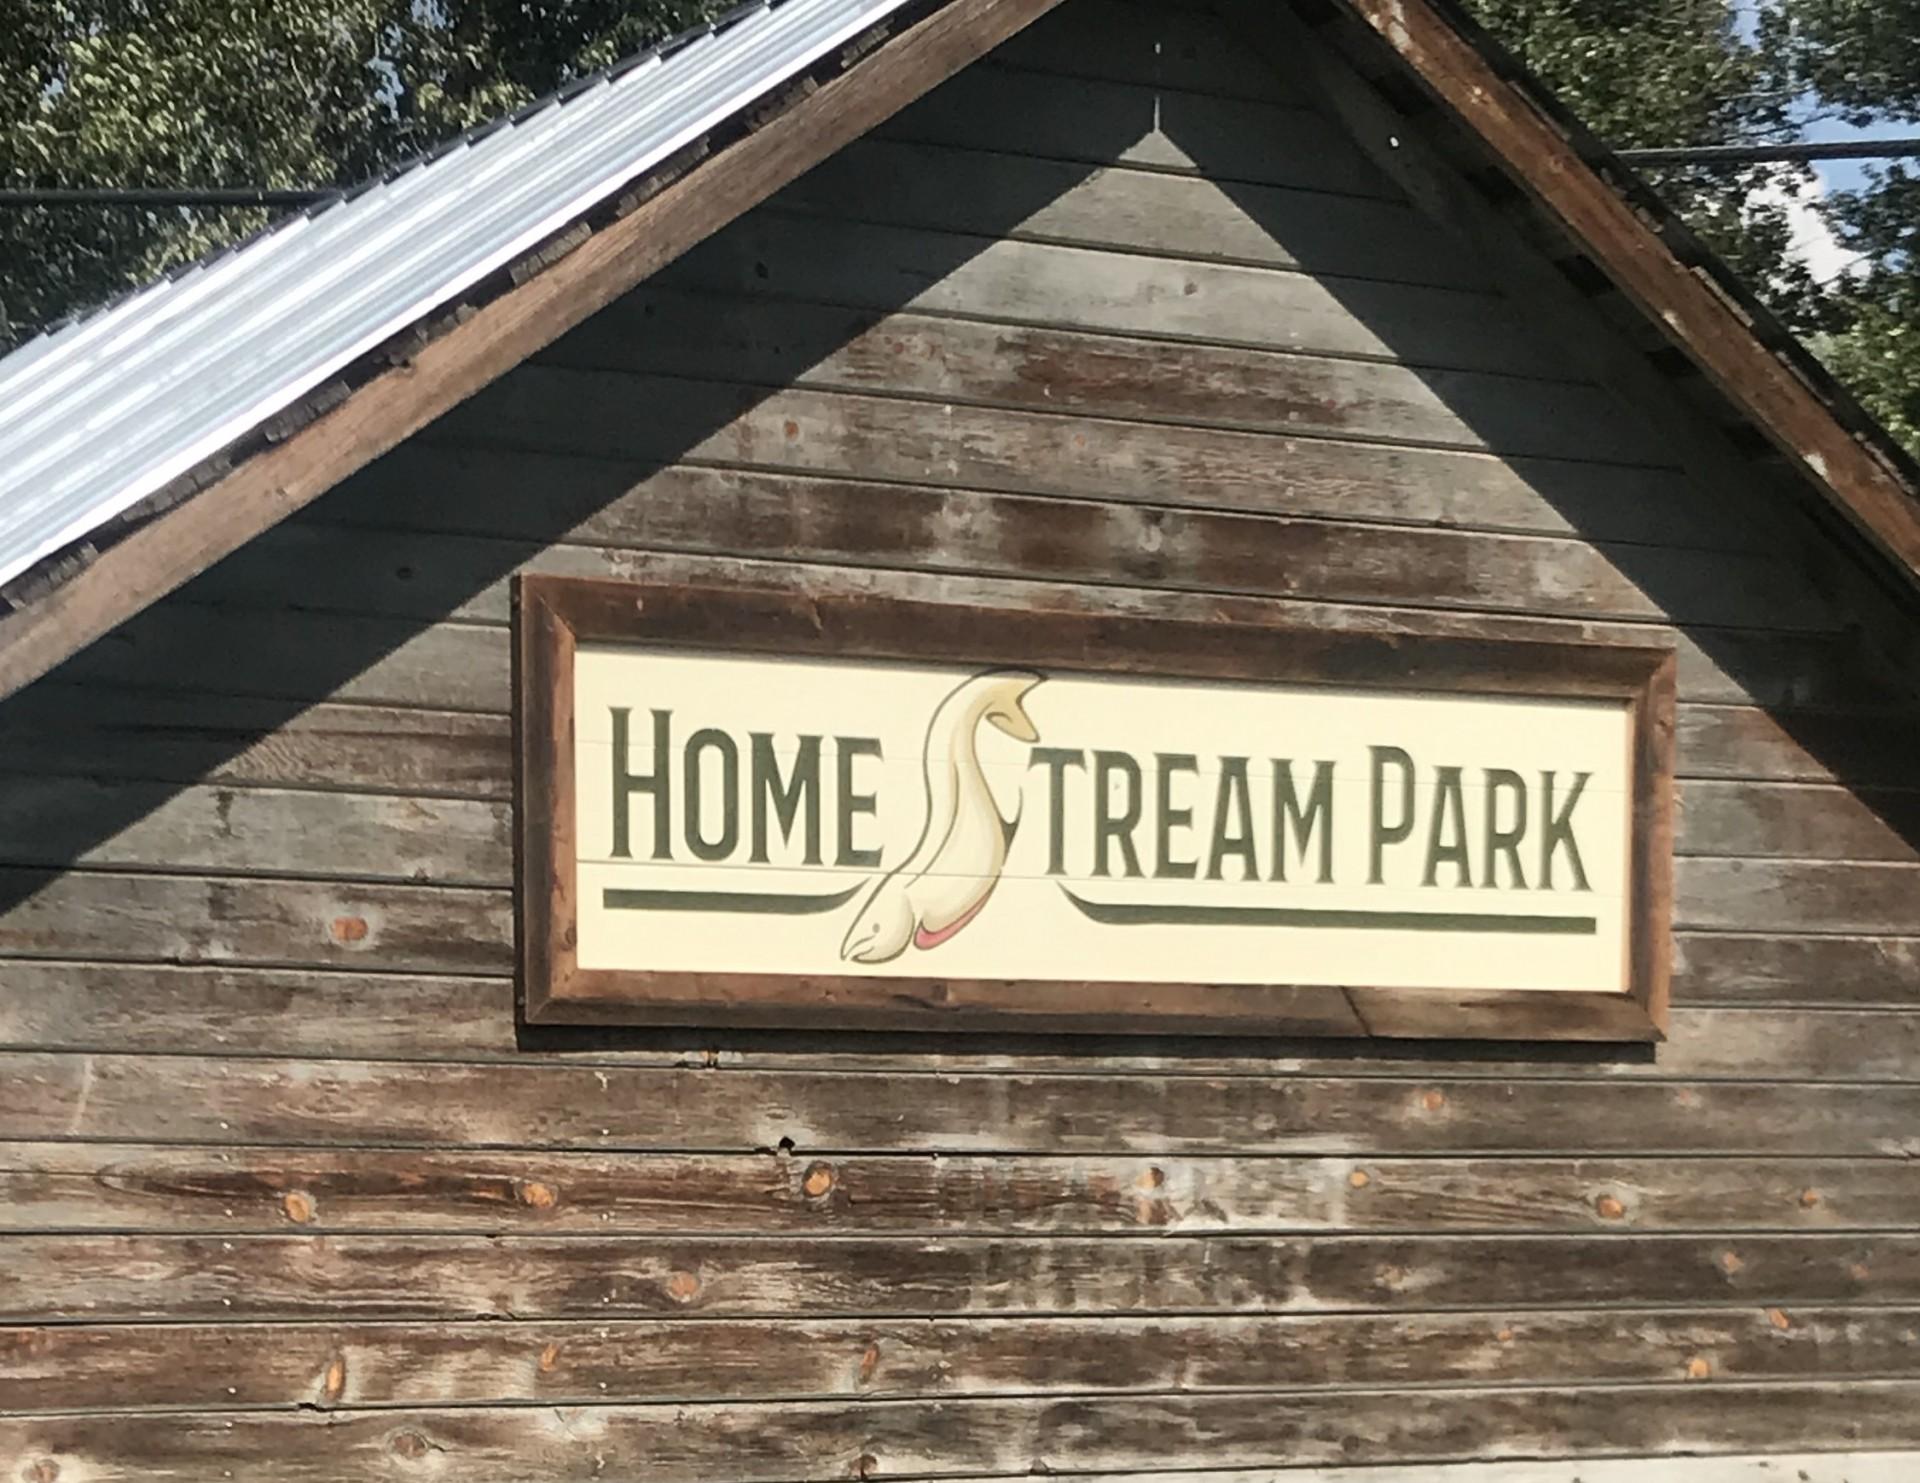 Homestream Park